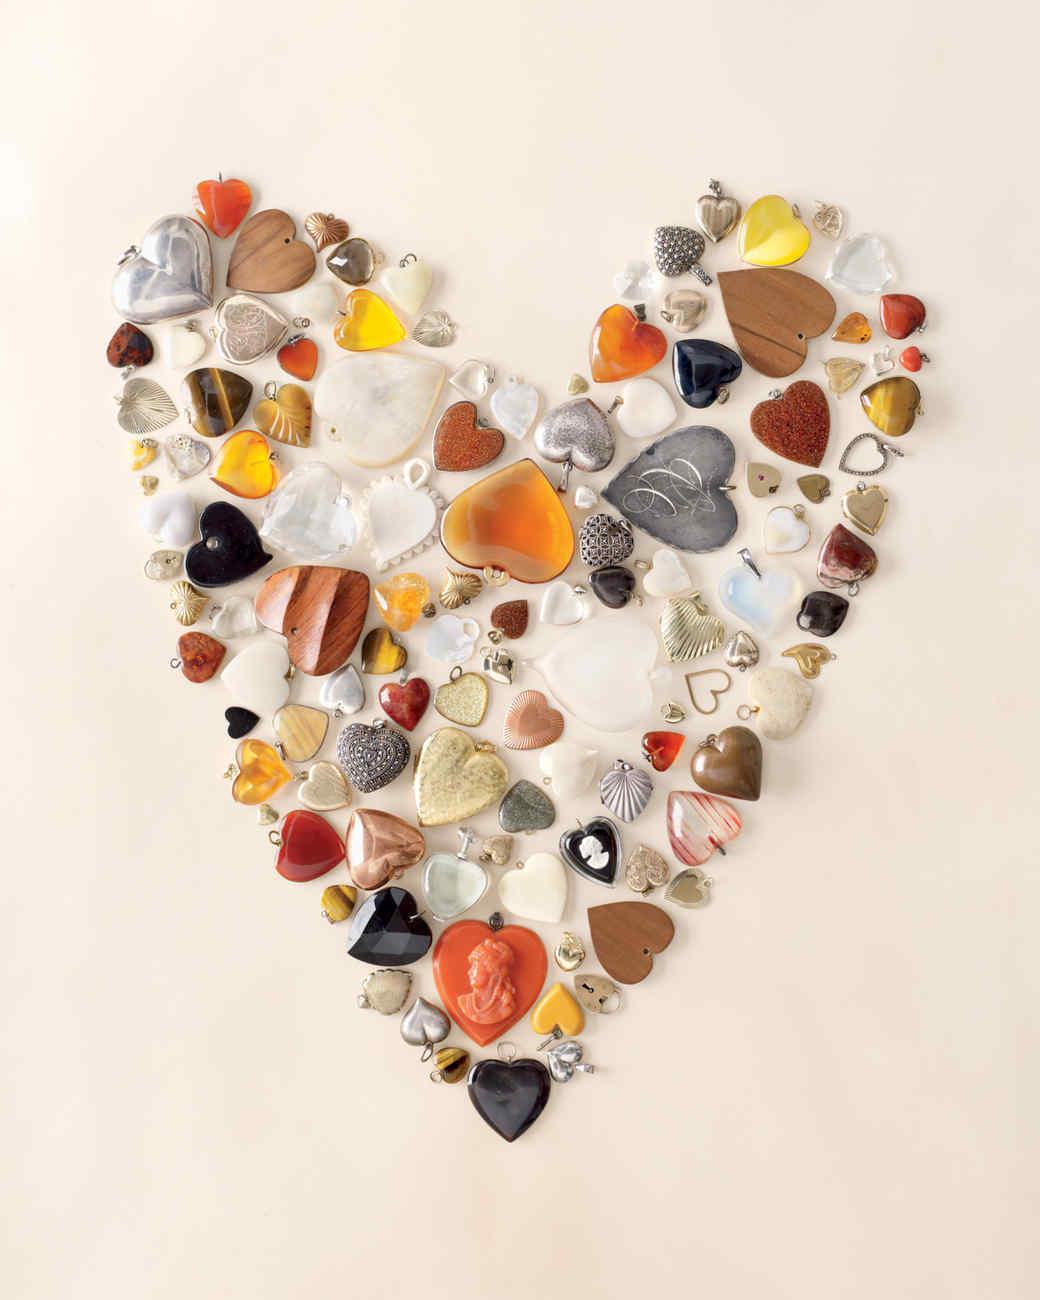 heart-charms-mld108078.jpg